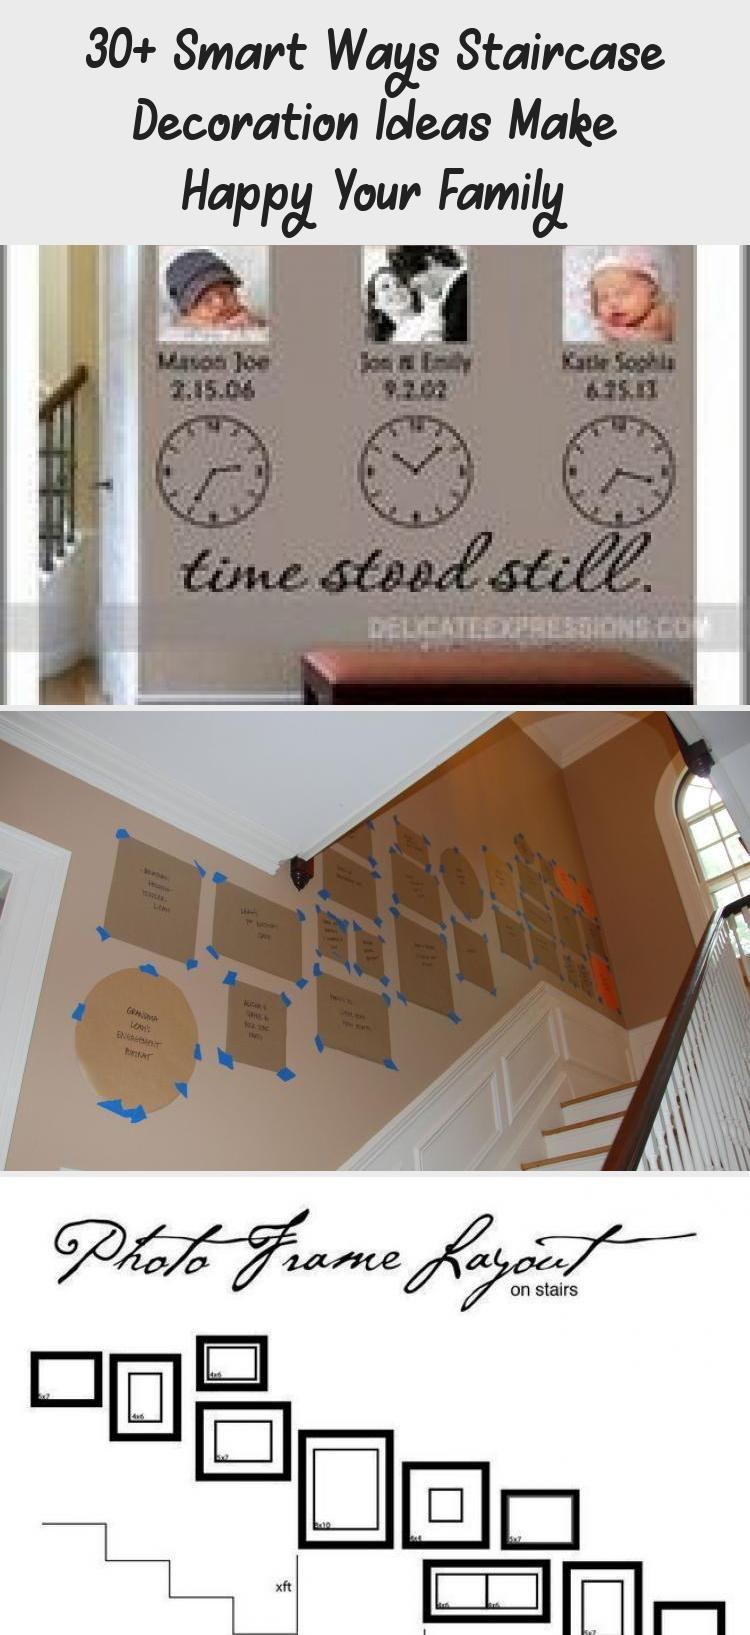 30+ Smart Ways Staircase Decoration Ideas Make Happy Your Family 30+ Smart Ways Staircase Decoration Ideas Make Happy Your Family - Kolega Space